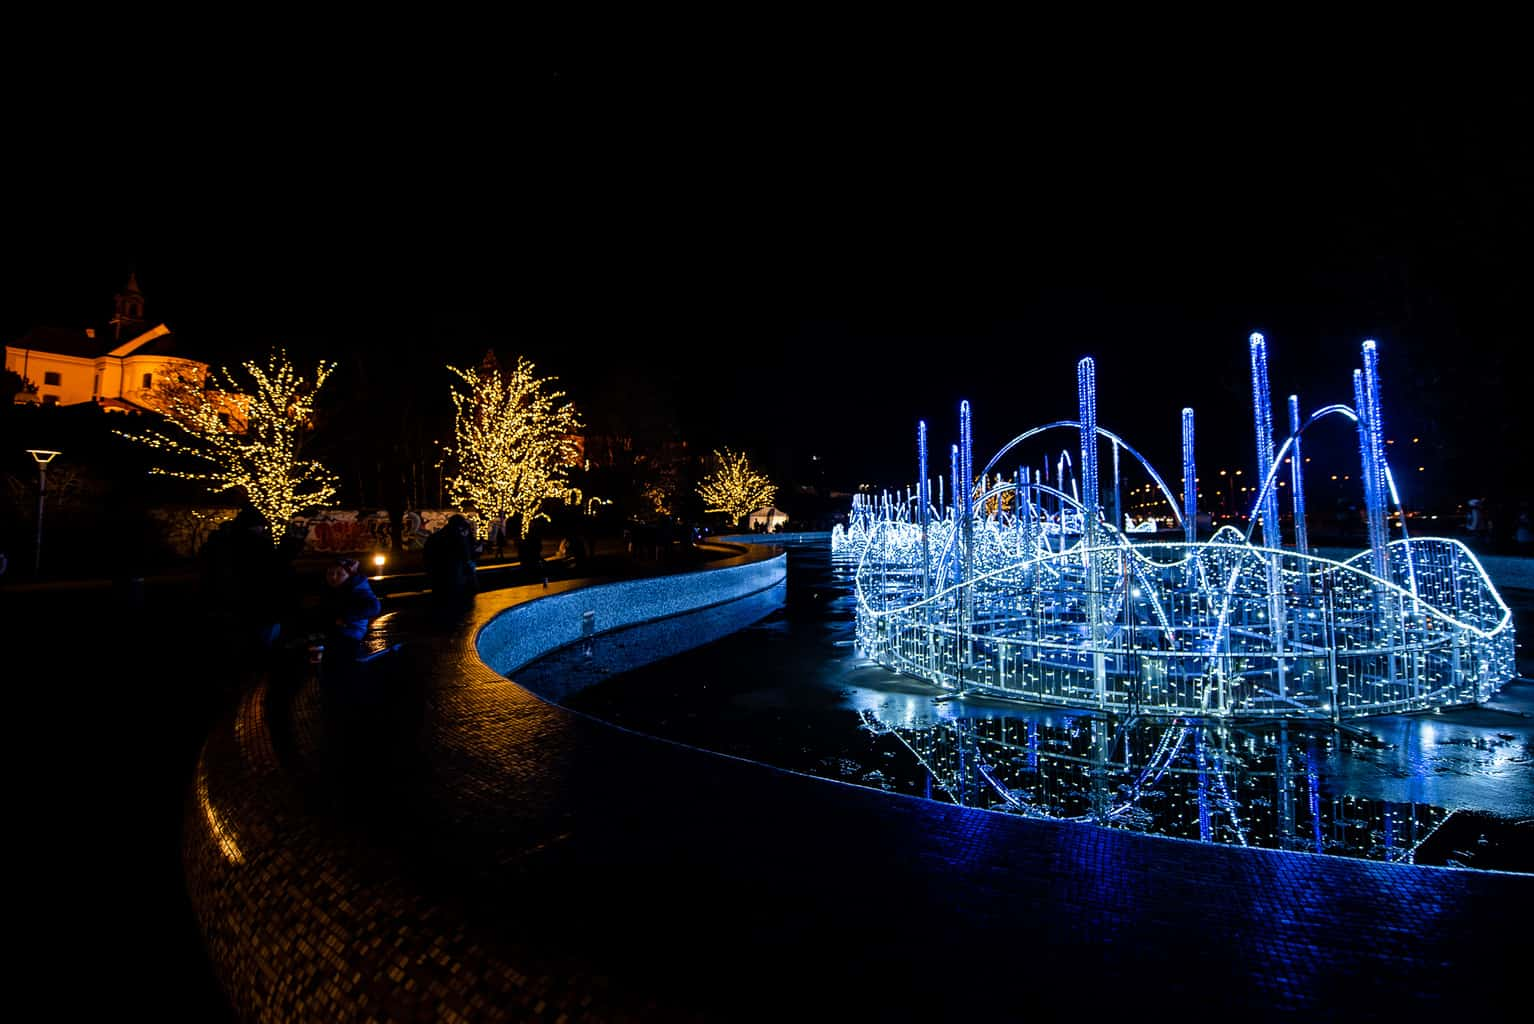 Multimedia Fountain Park in Warsaw Poland